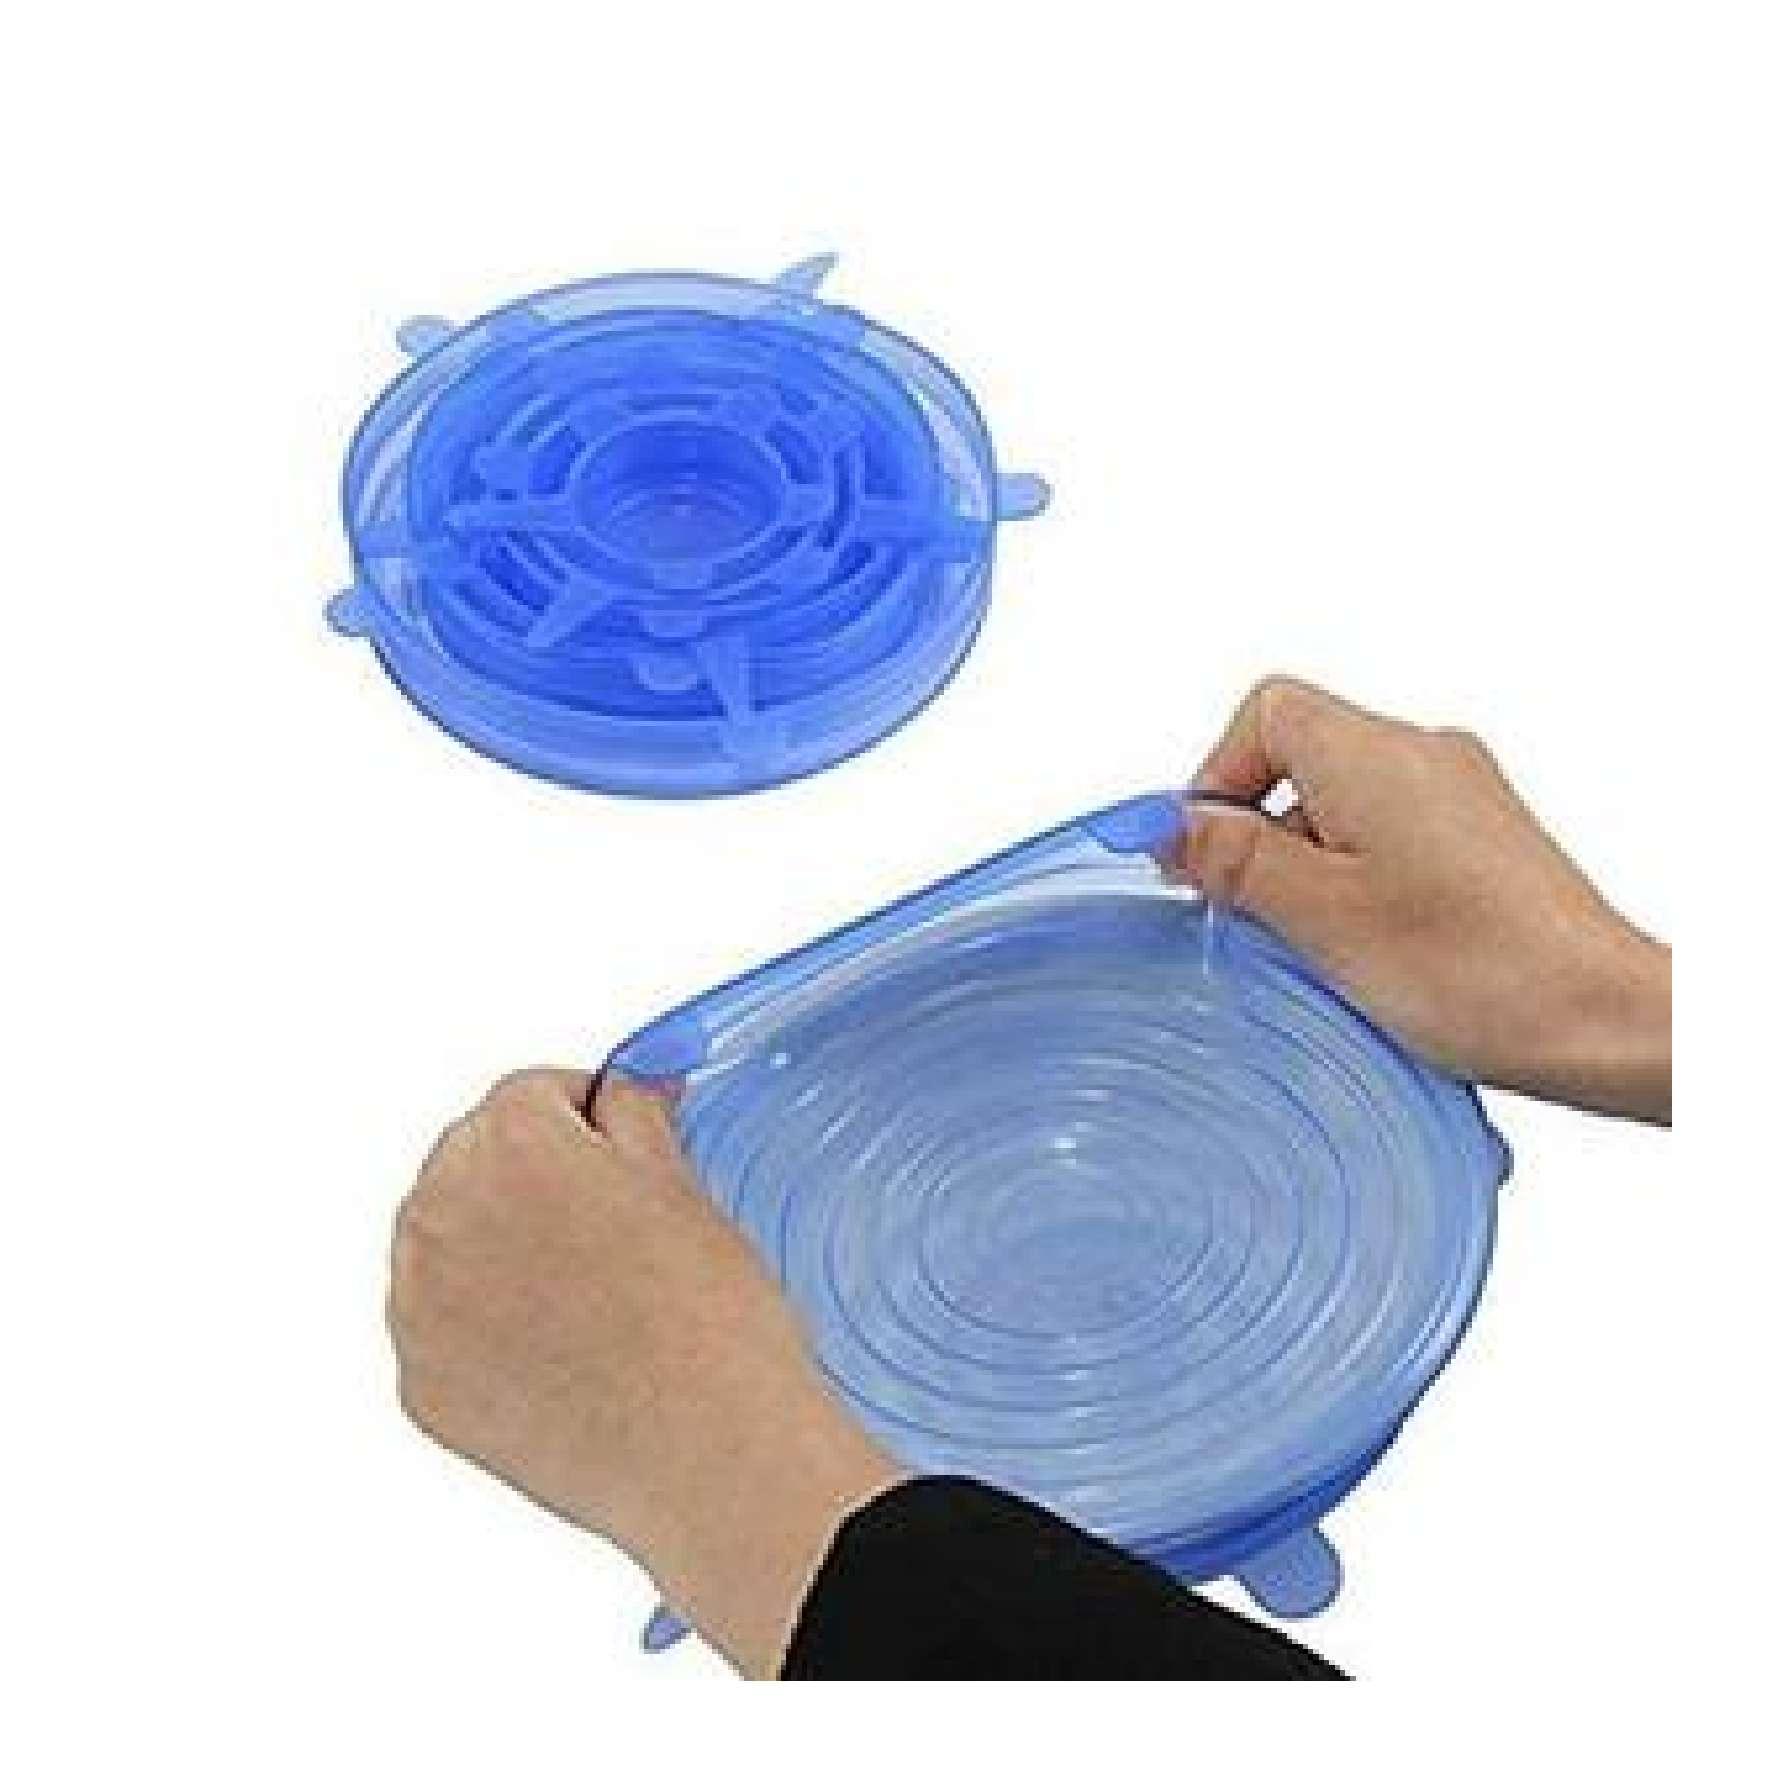 Microwave Safe Silicone Stretch Lids Flexible Bowl Covers 6-Piece Transparent